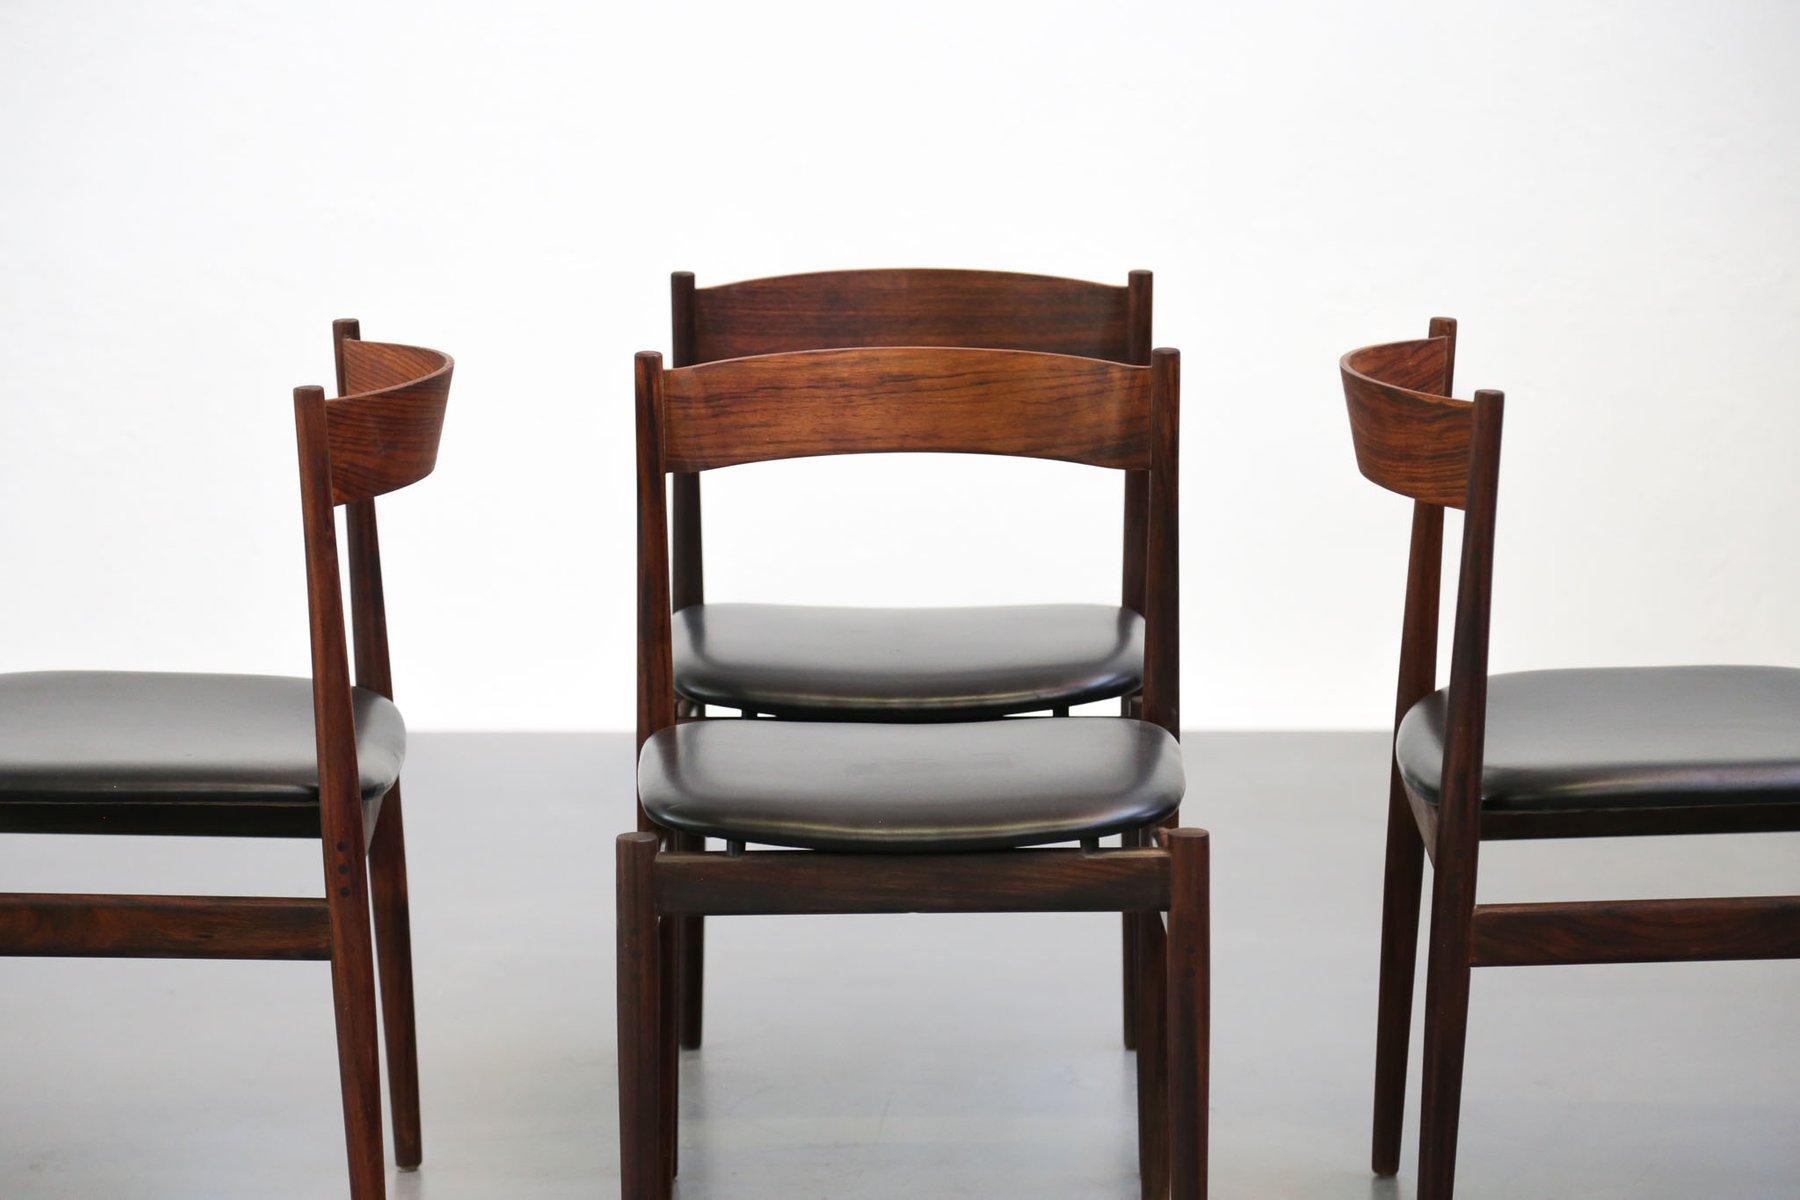 italienische st hle von gianfranco frattini f r cassina 1960er 4er set bei pamono kaufen. Black Bedroom Furniture Sets. Home Design Ideas